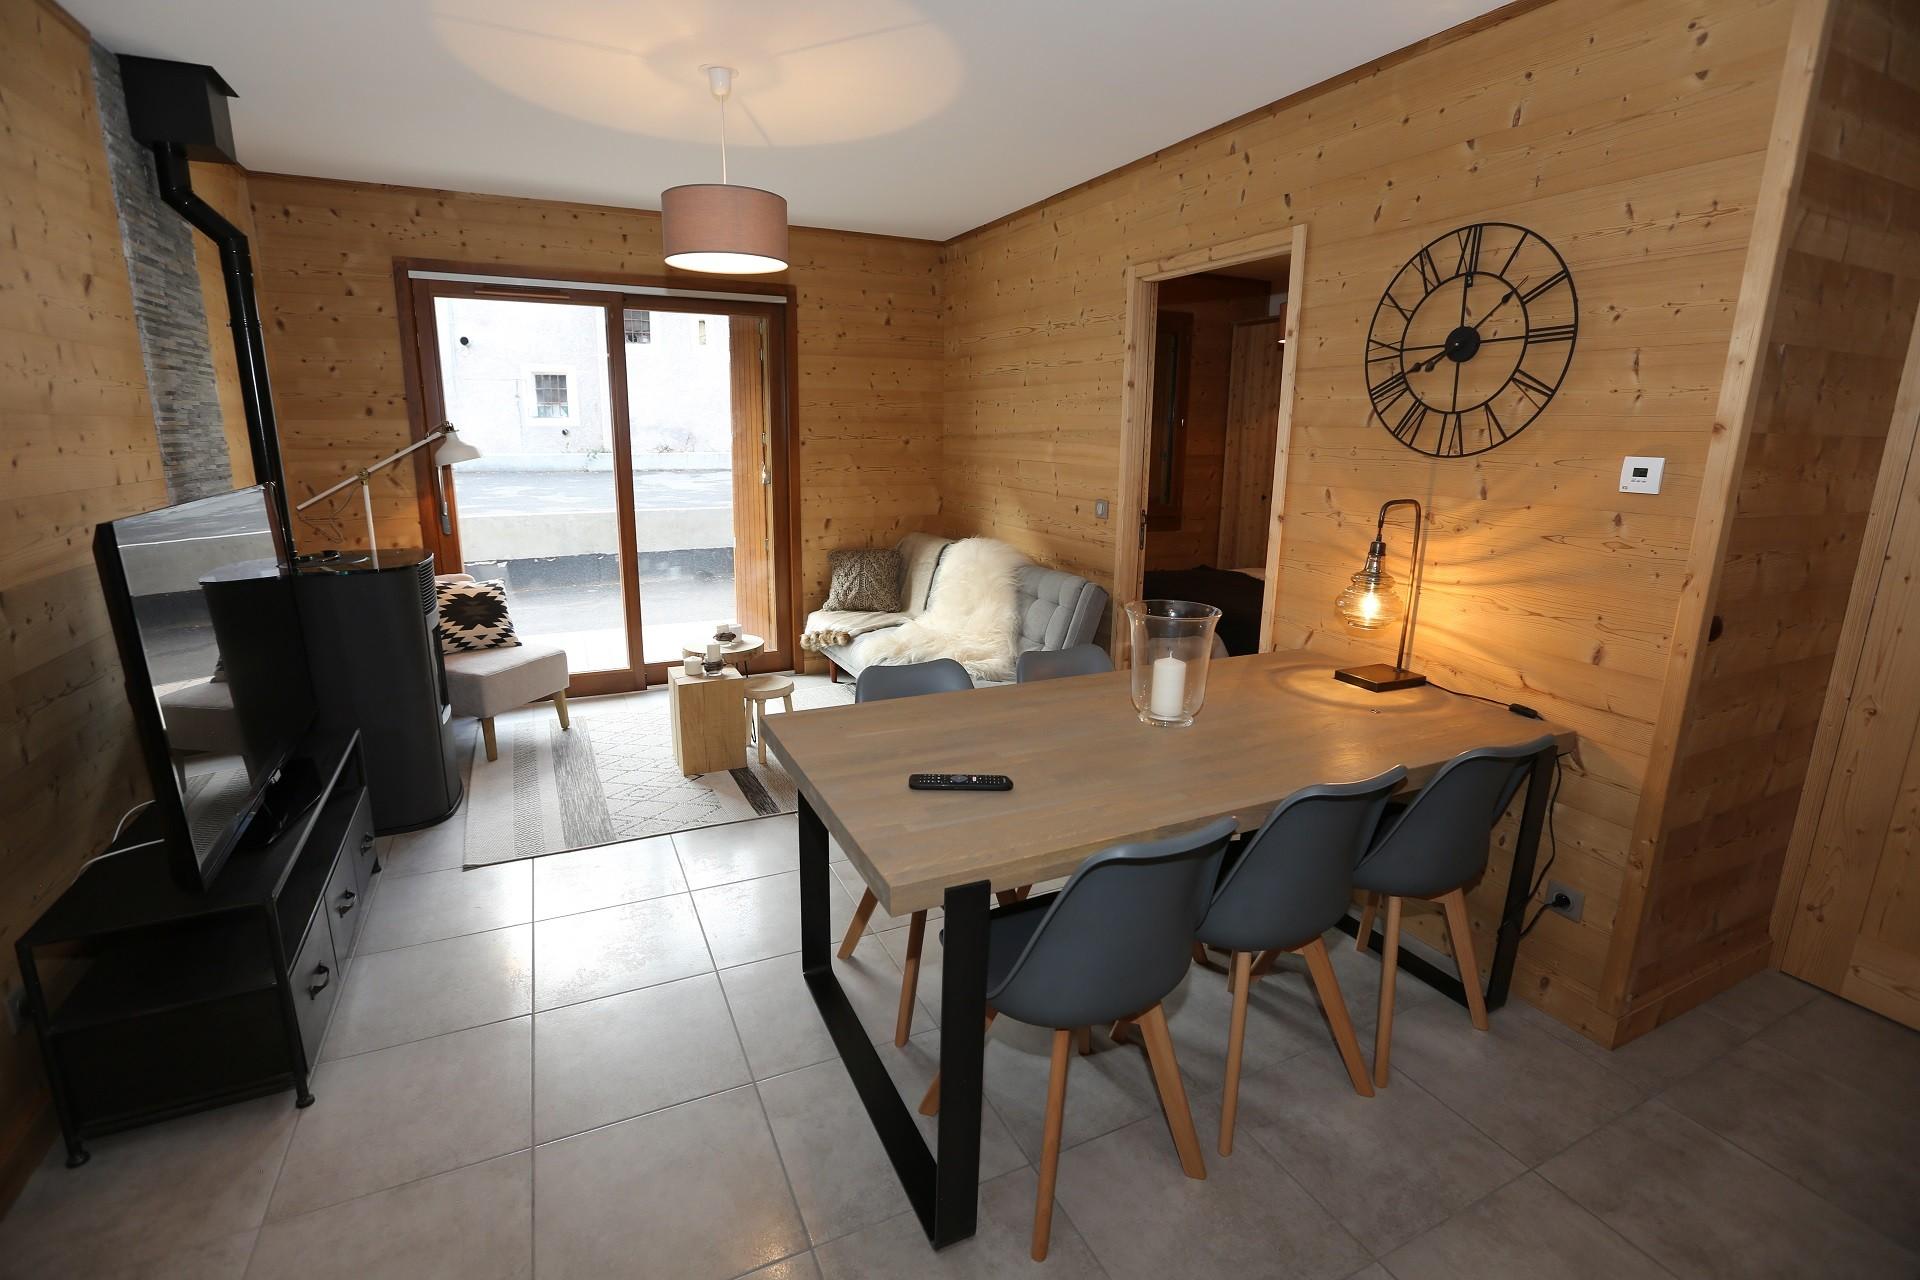 Residence Maison Blanche Lille location le cœur alpin (n°004) - residence l'epinette